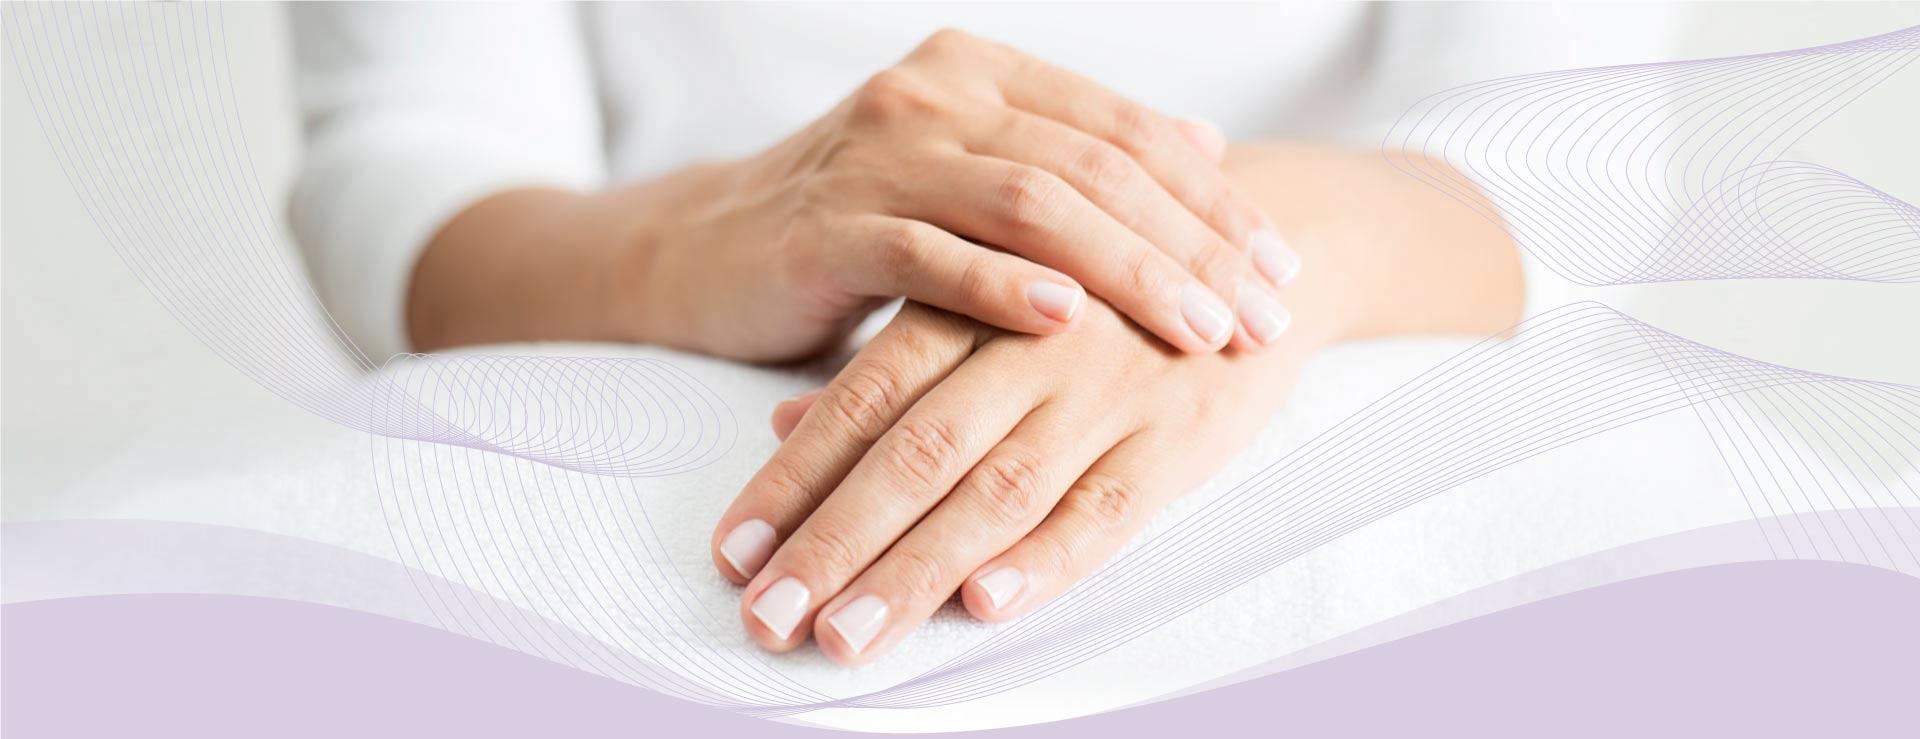 Physiotherapie Bianca Dziggel Neubrandenburg